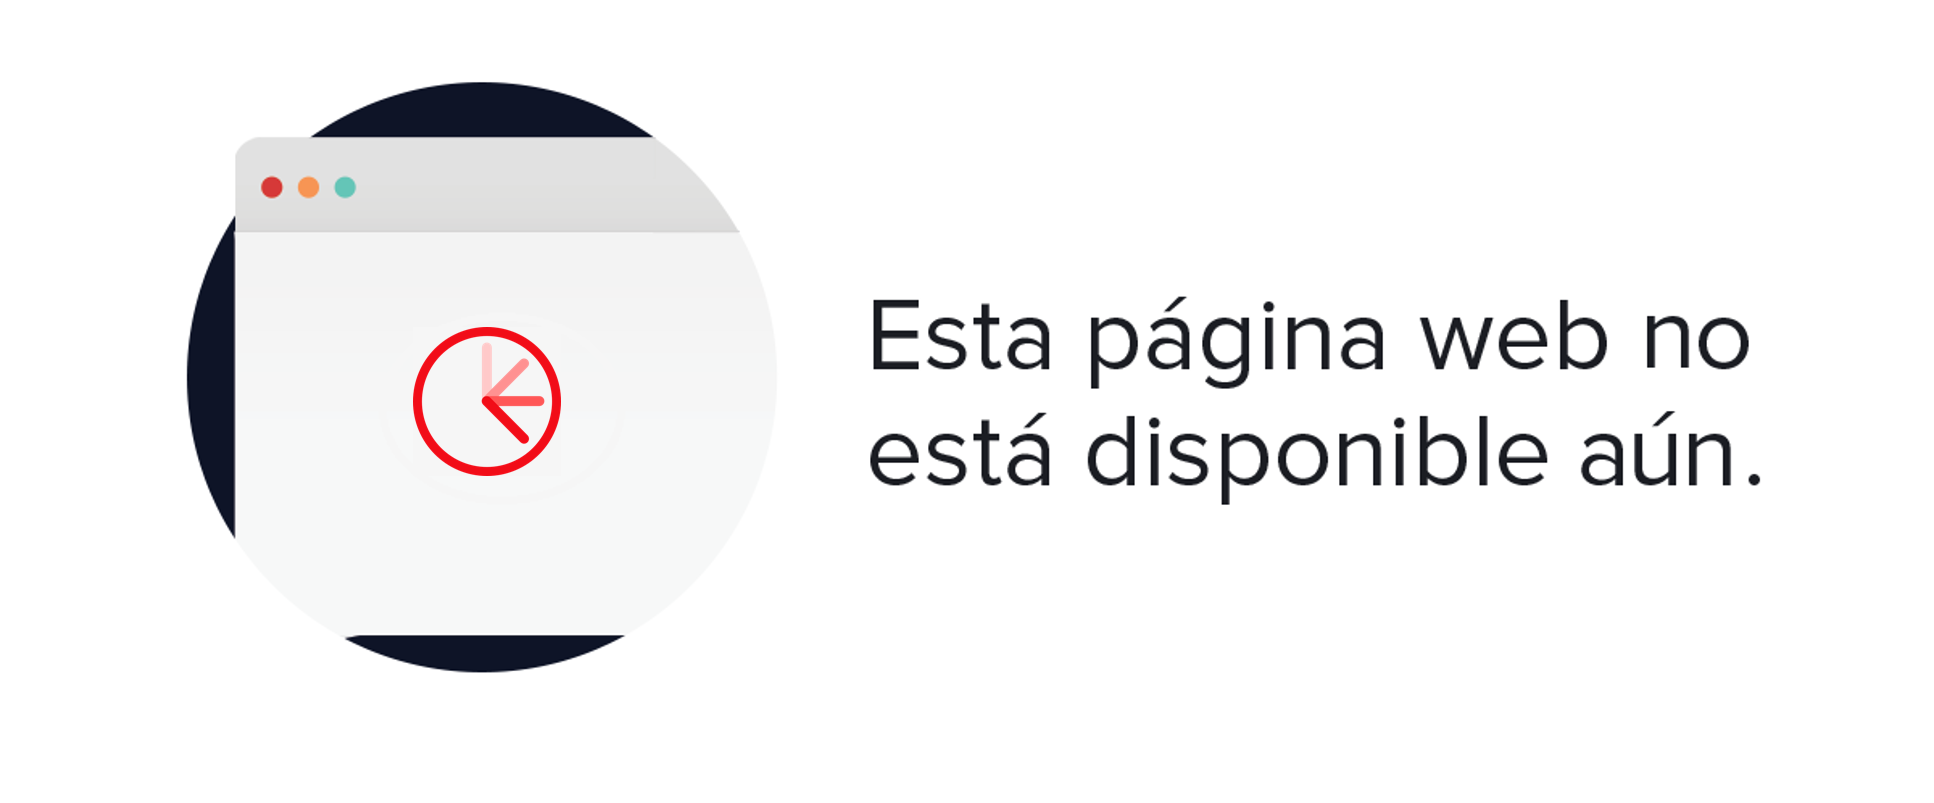 OXXO - Chaqueta de Mujer OXXO larga de rayas Blanco 8681613096868 - QVJPGPC